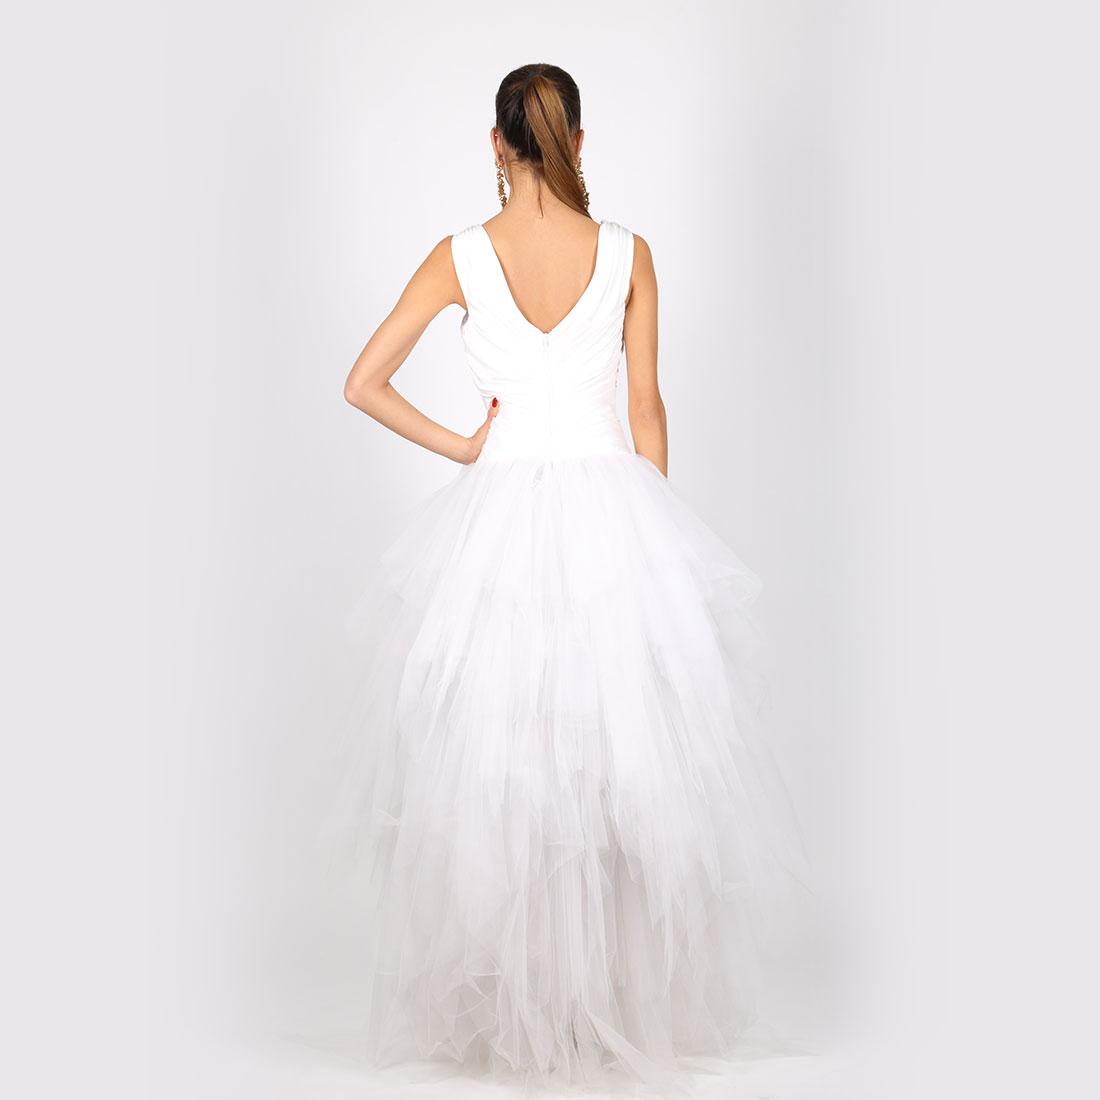 biele-saty-s-korzetom-s-velkou-rafinovanou-suknou-z-tylu – Katleen f90e48e7829